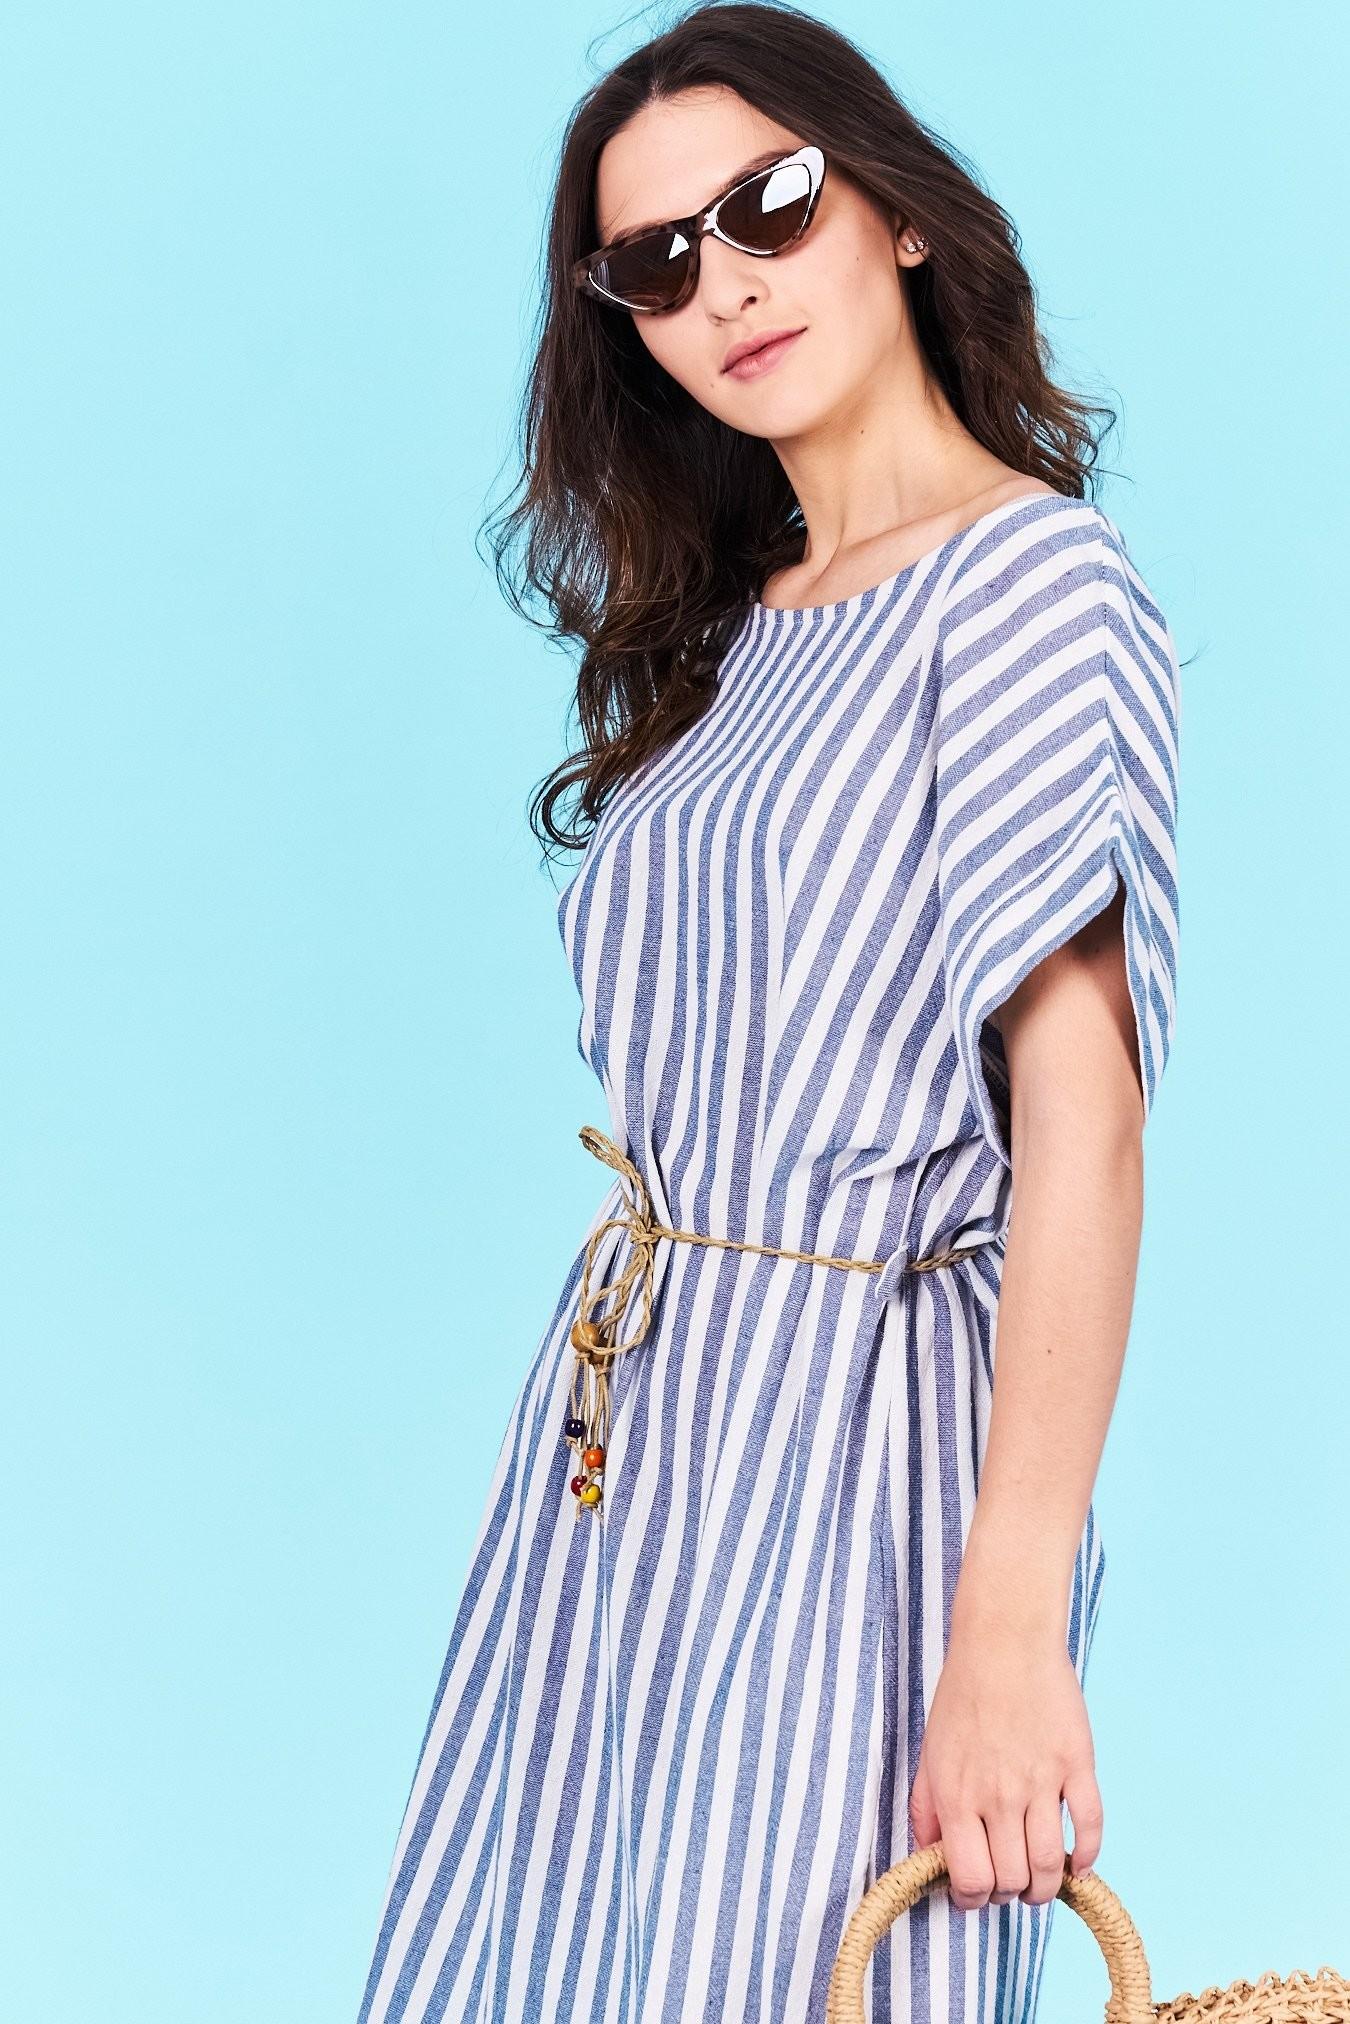 Dámske pruhované šaty modré Norah Veľkosť UNI-verzálna Vyrobené z  príjemného materiálu. Pohodlné šaty c8dc44b2378